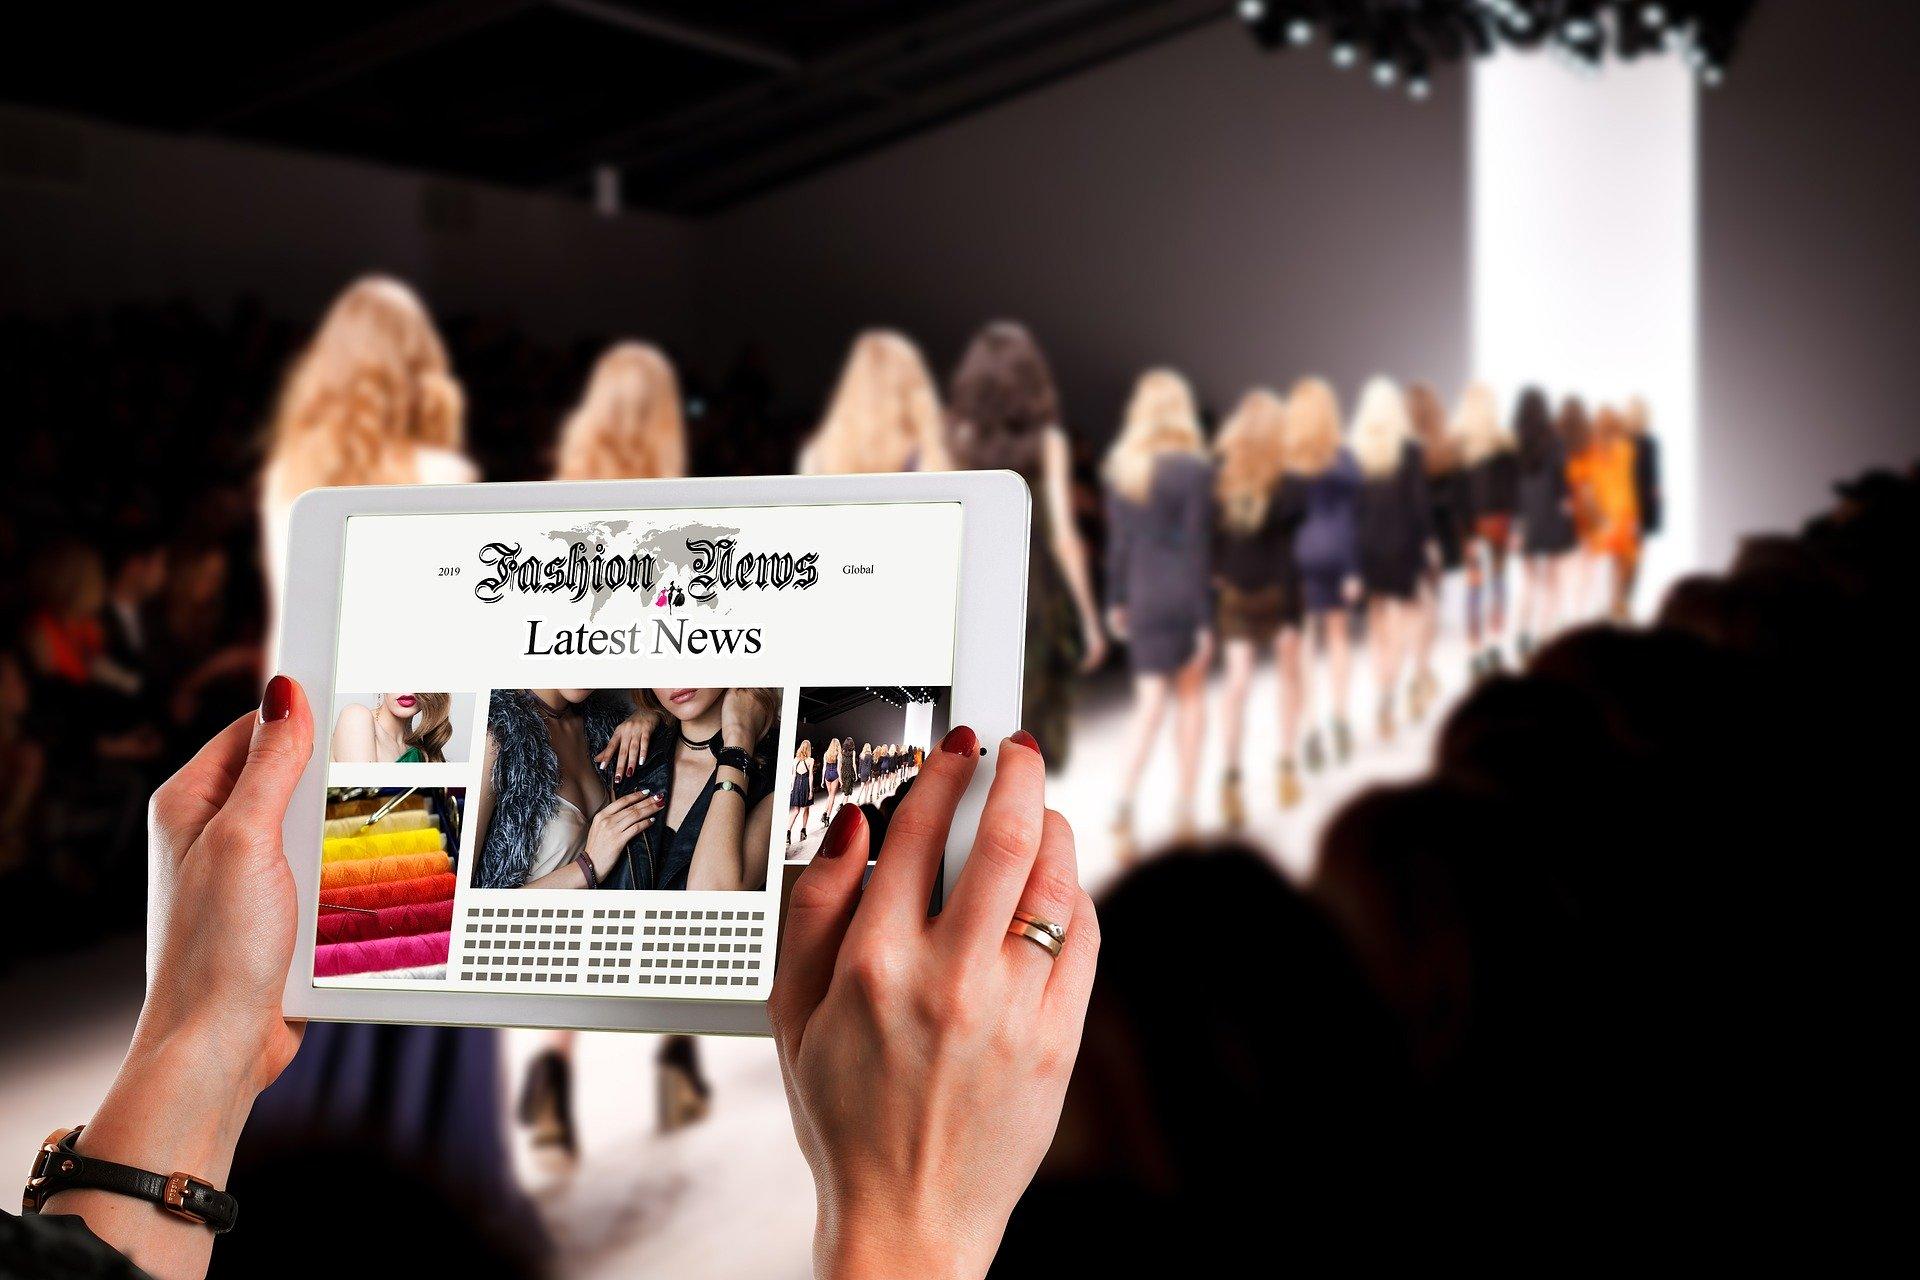 The Best Fashion Model Training